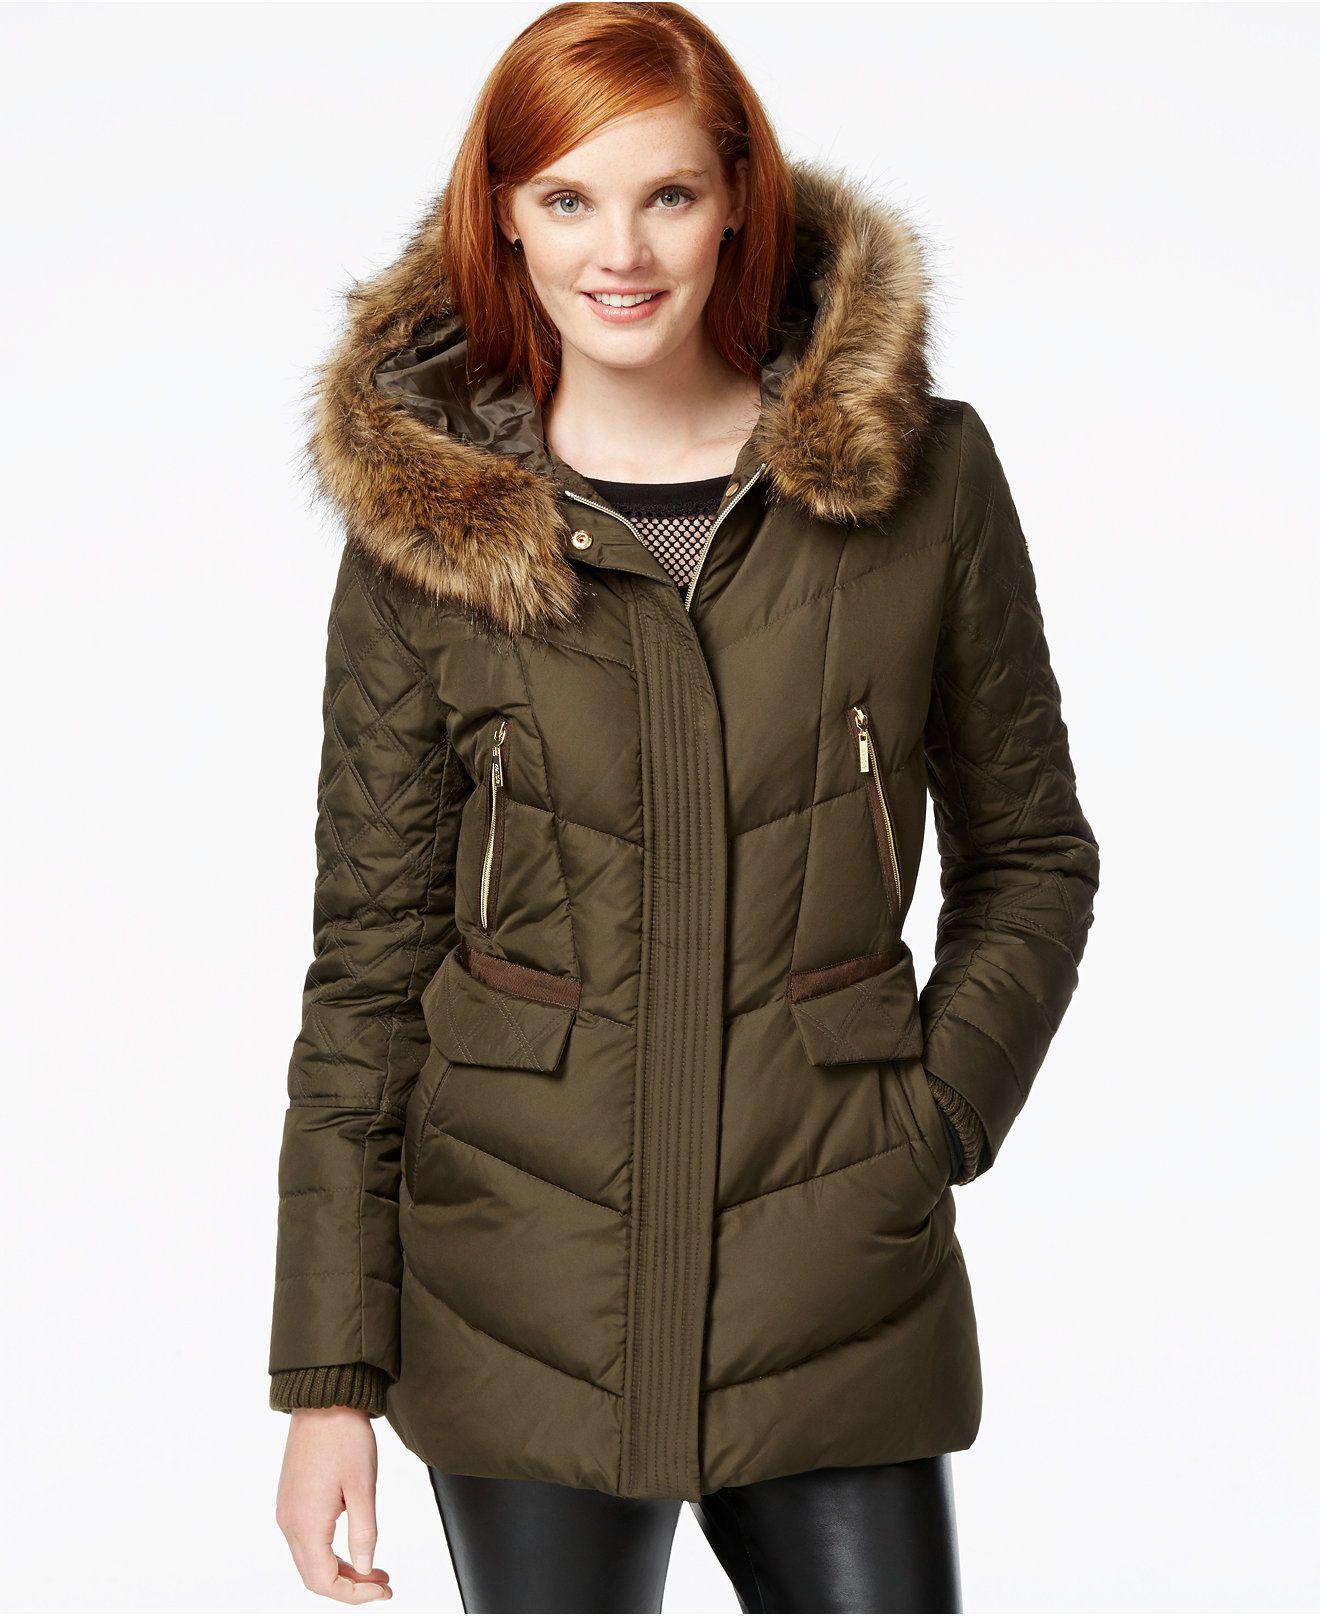 2804e3122 kensie Faux-Fur-Trim Quilted Puffer Coat - Coats - Women - Macy's ...